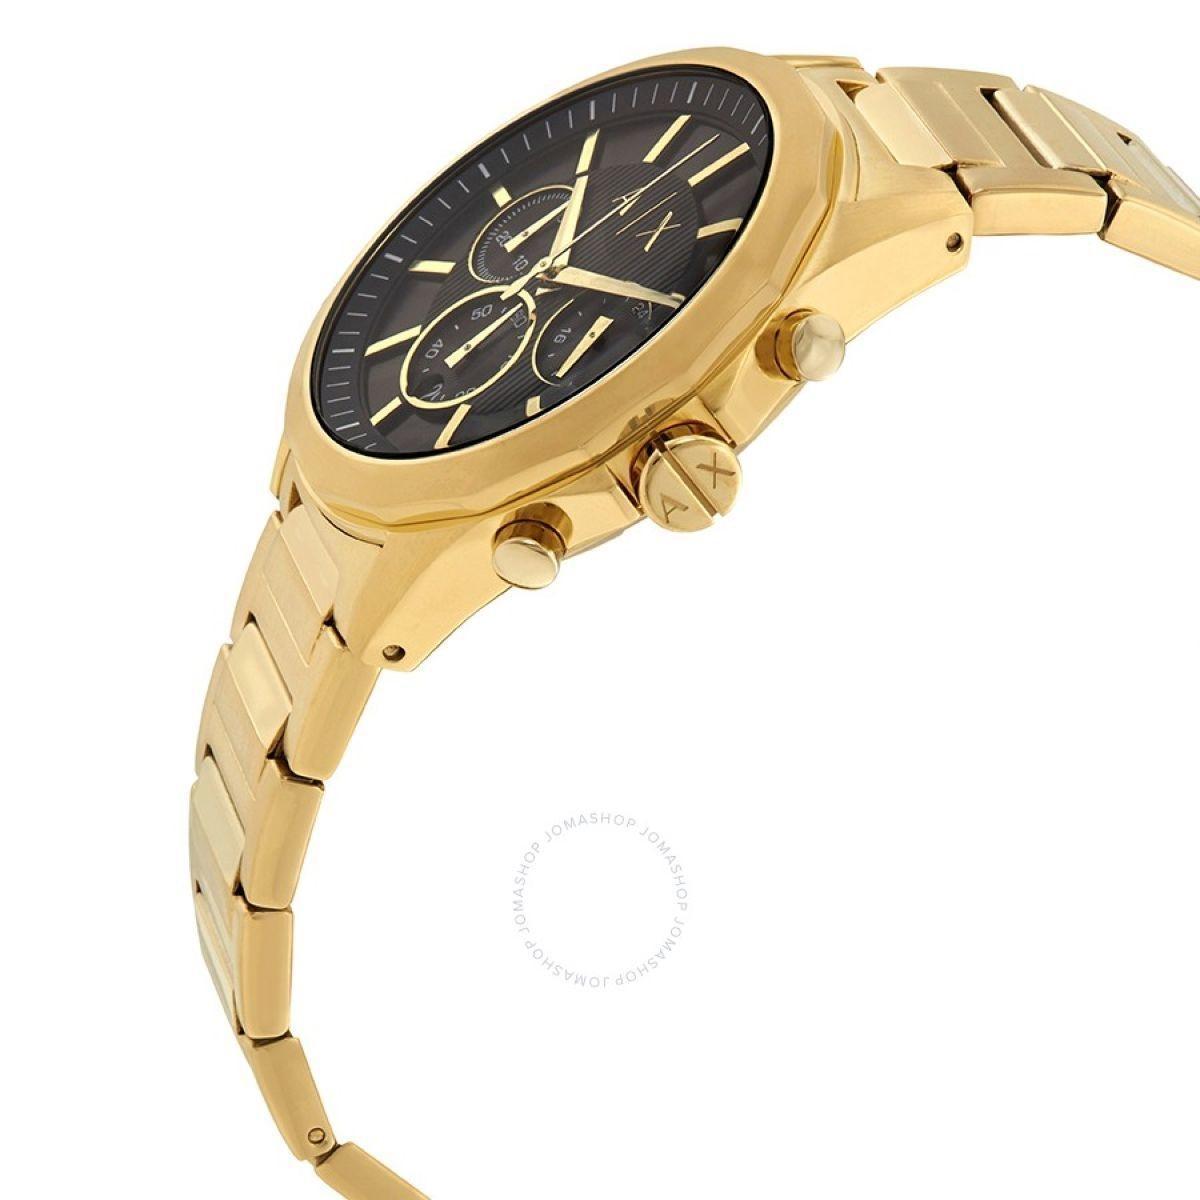 c0590404343 Relogio masculino armani exchange dourado ax2611 - Relógio Masculino ...